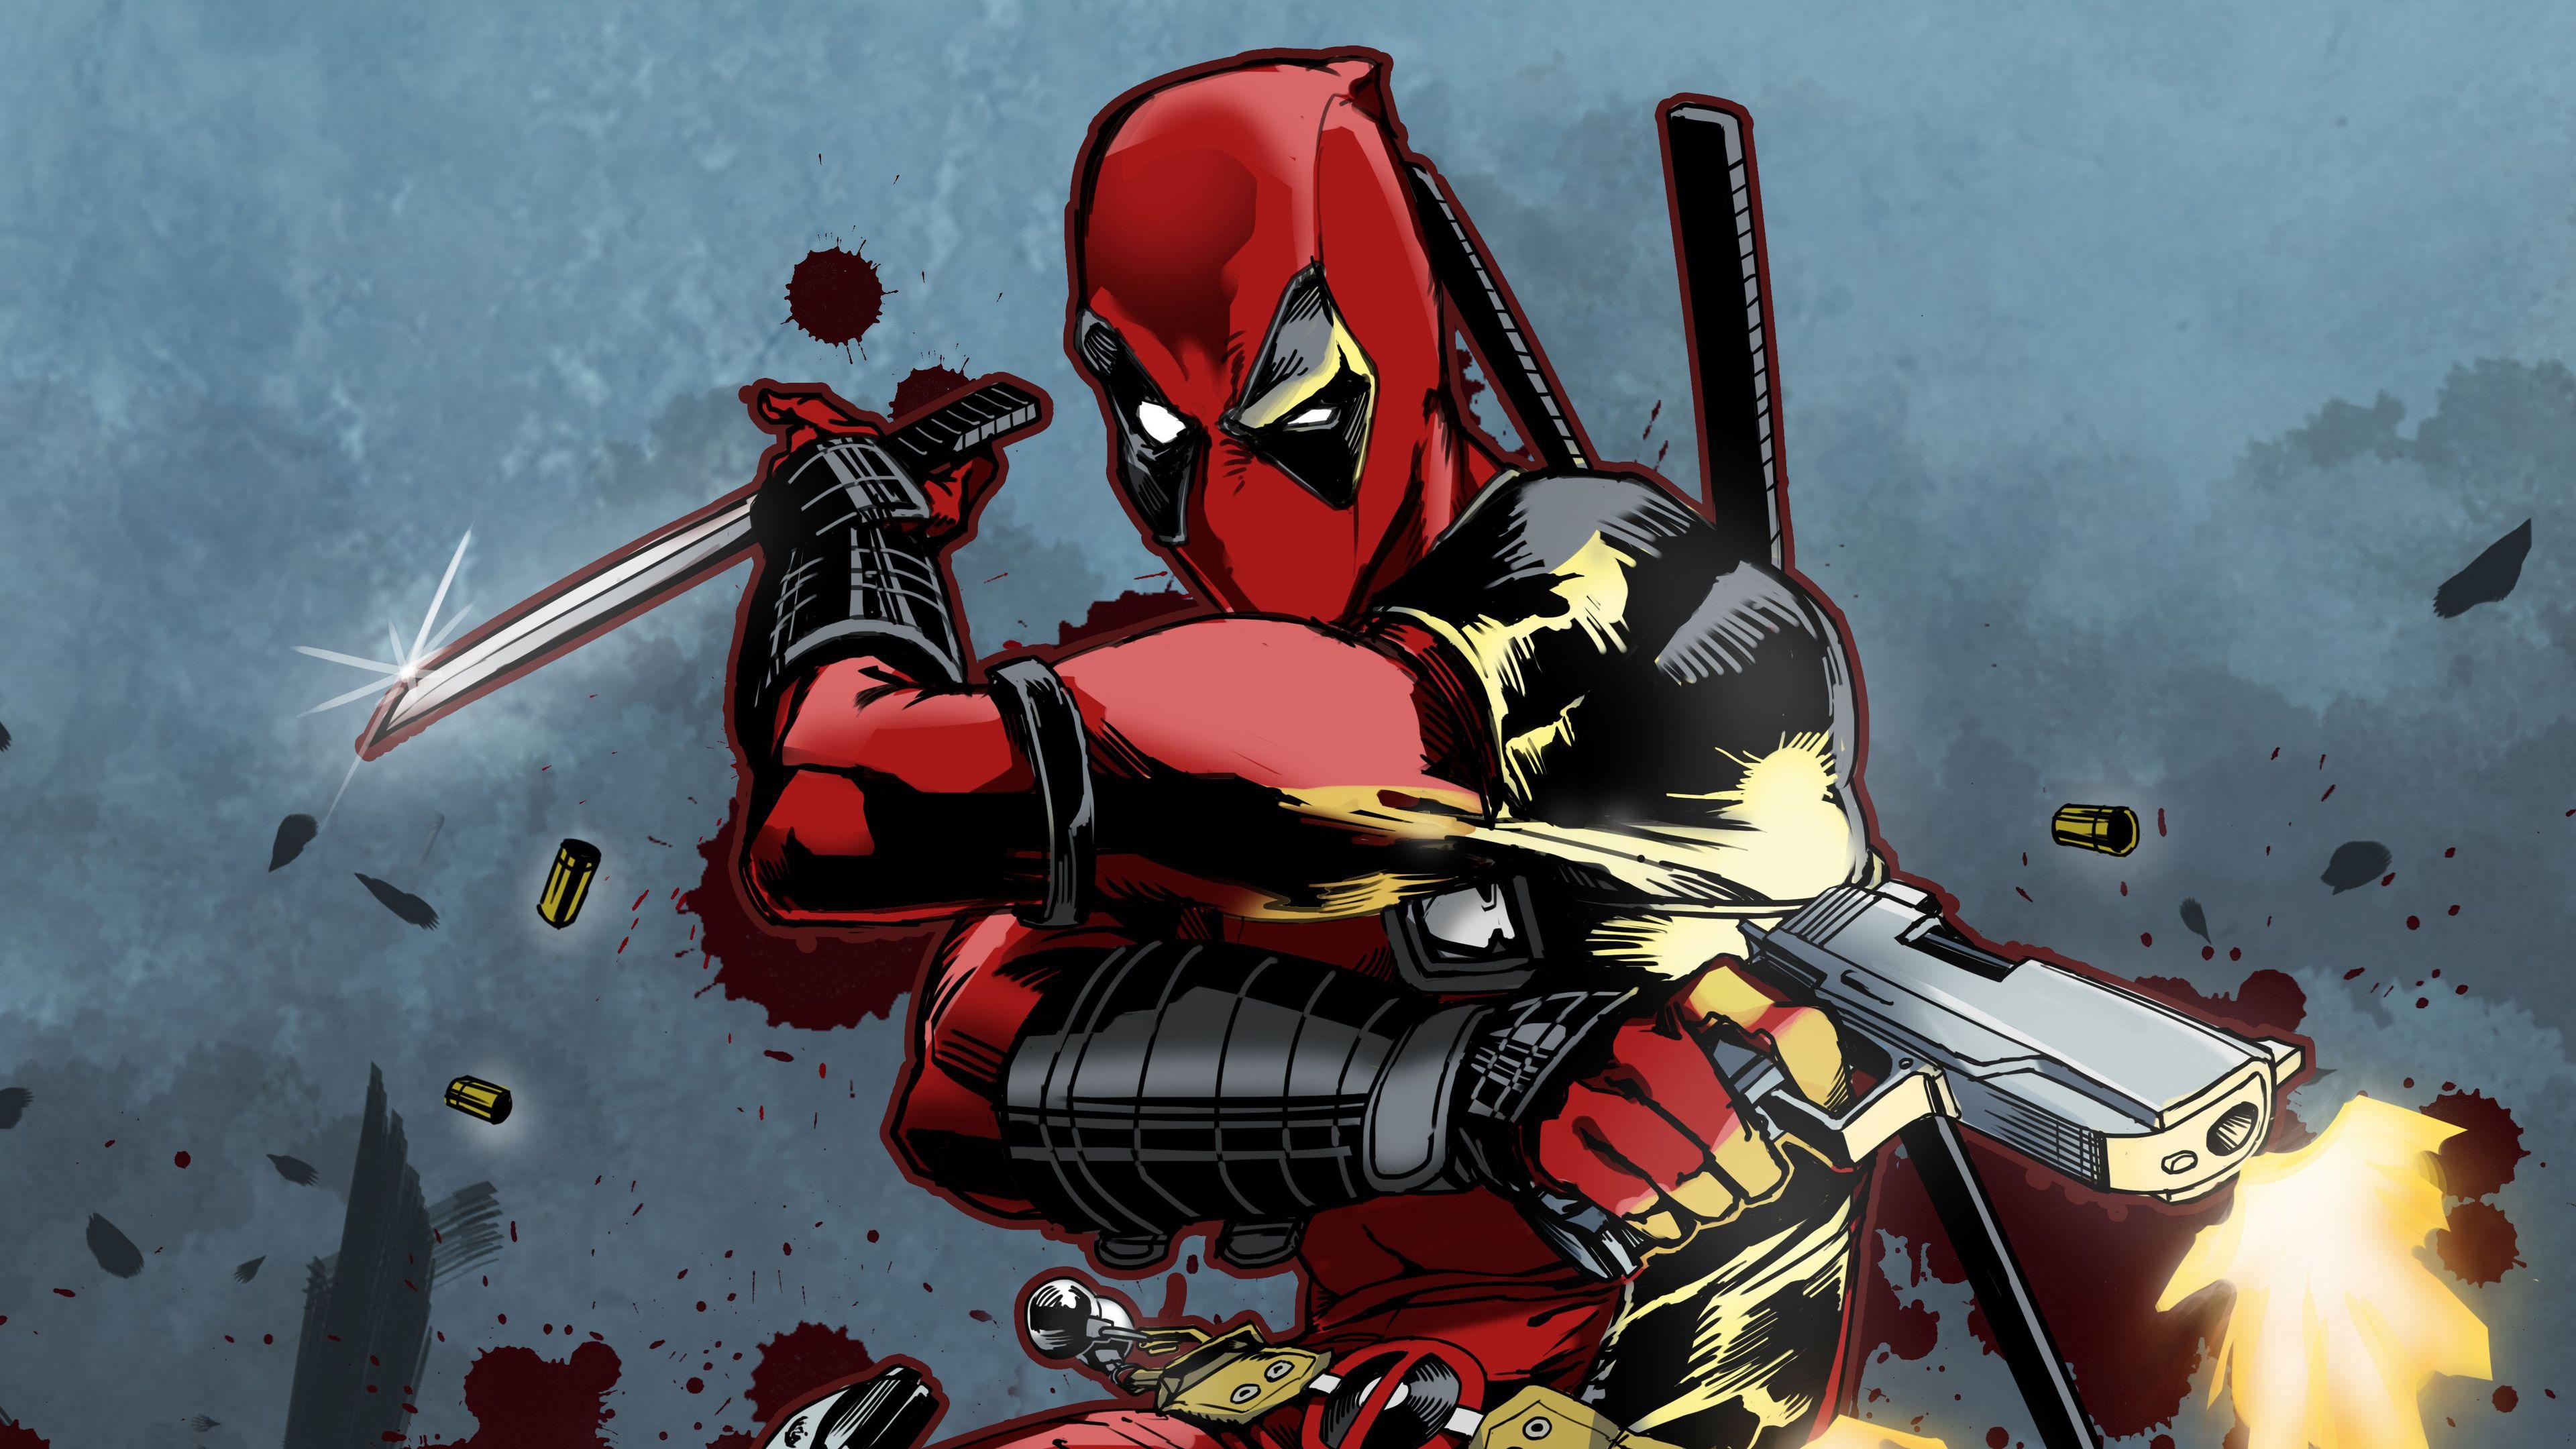 Deadpool New Art 4k Superheroes Wallpapers Hd Wallpapers Digital Art Wallpapers Deadpool Wallpapers Artwork Wallpa Deadpool Wallpaper New Art Art Wallpaper